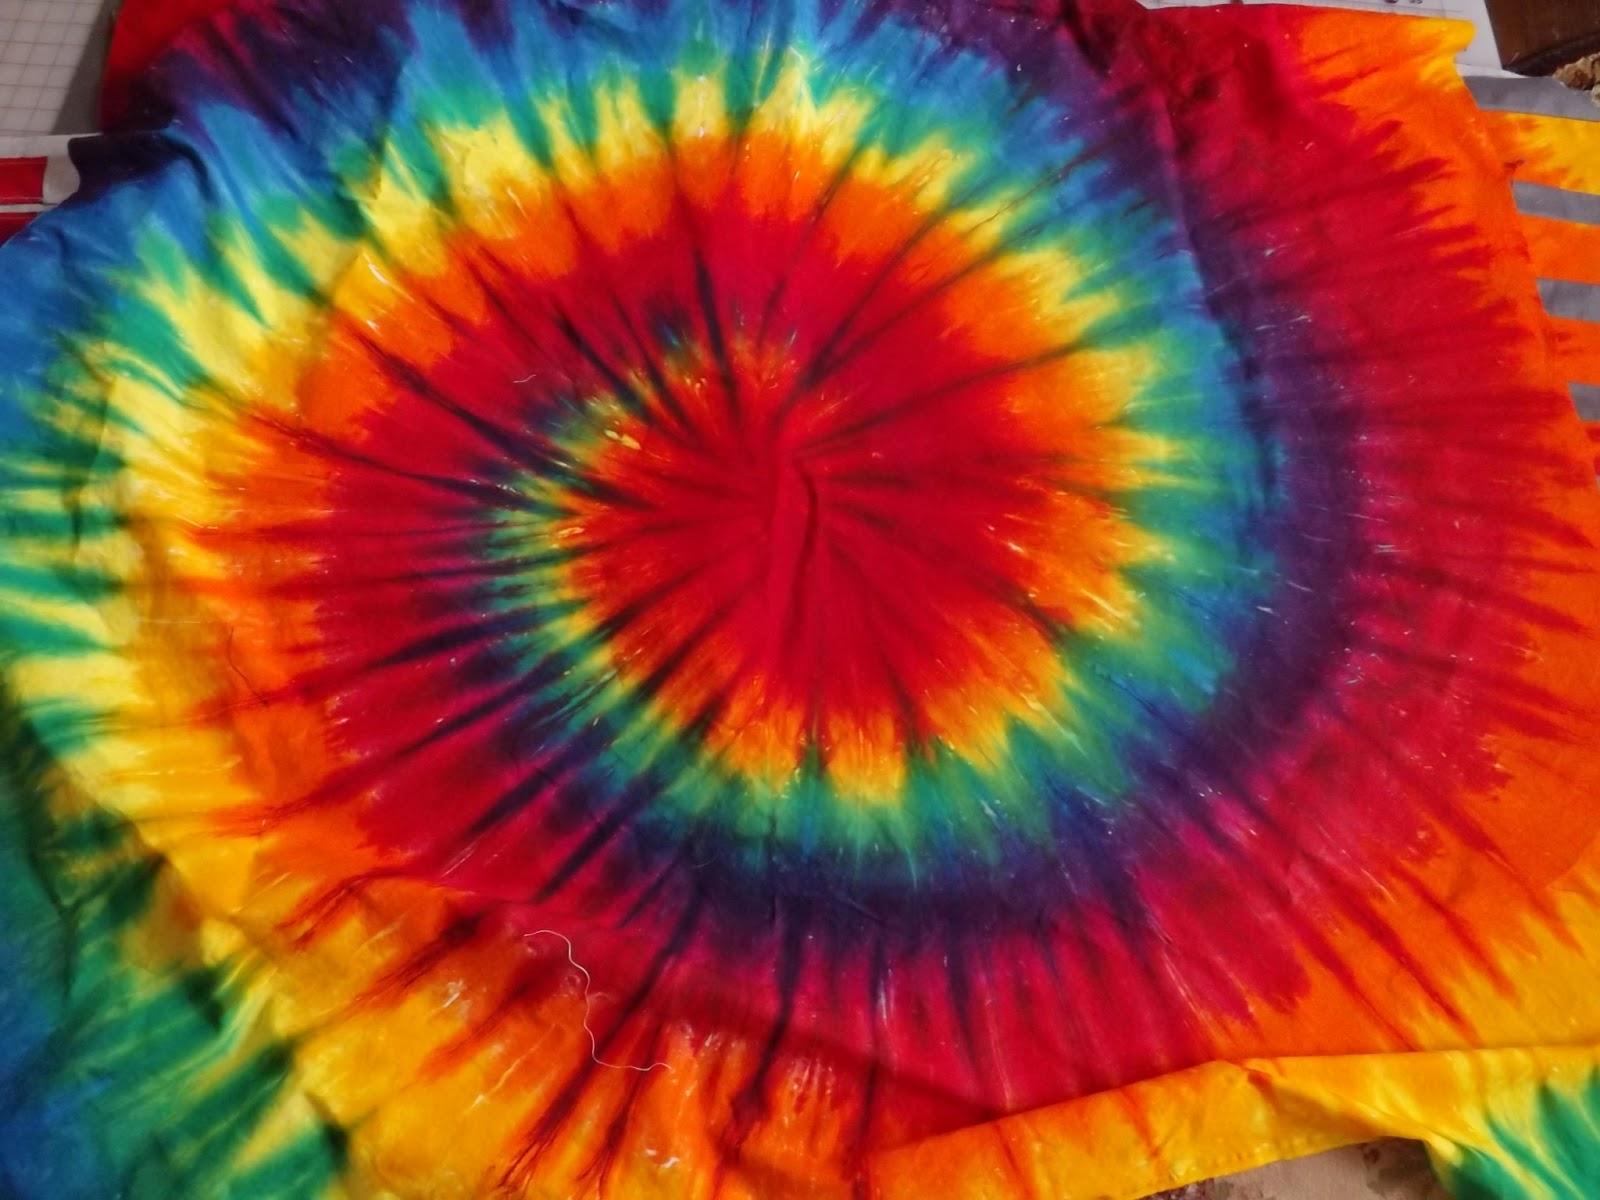 Wallpaper Tie Dye Wallpaper 1600x1200